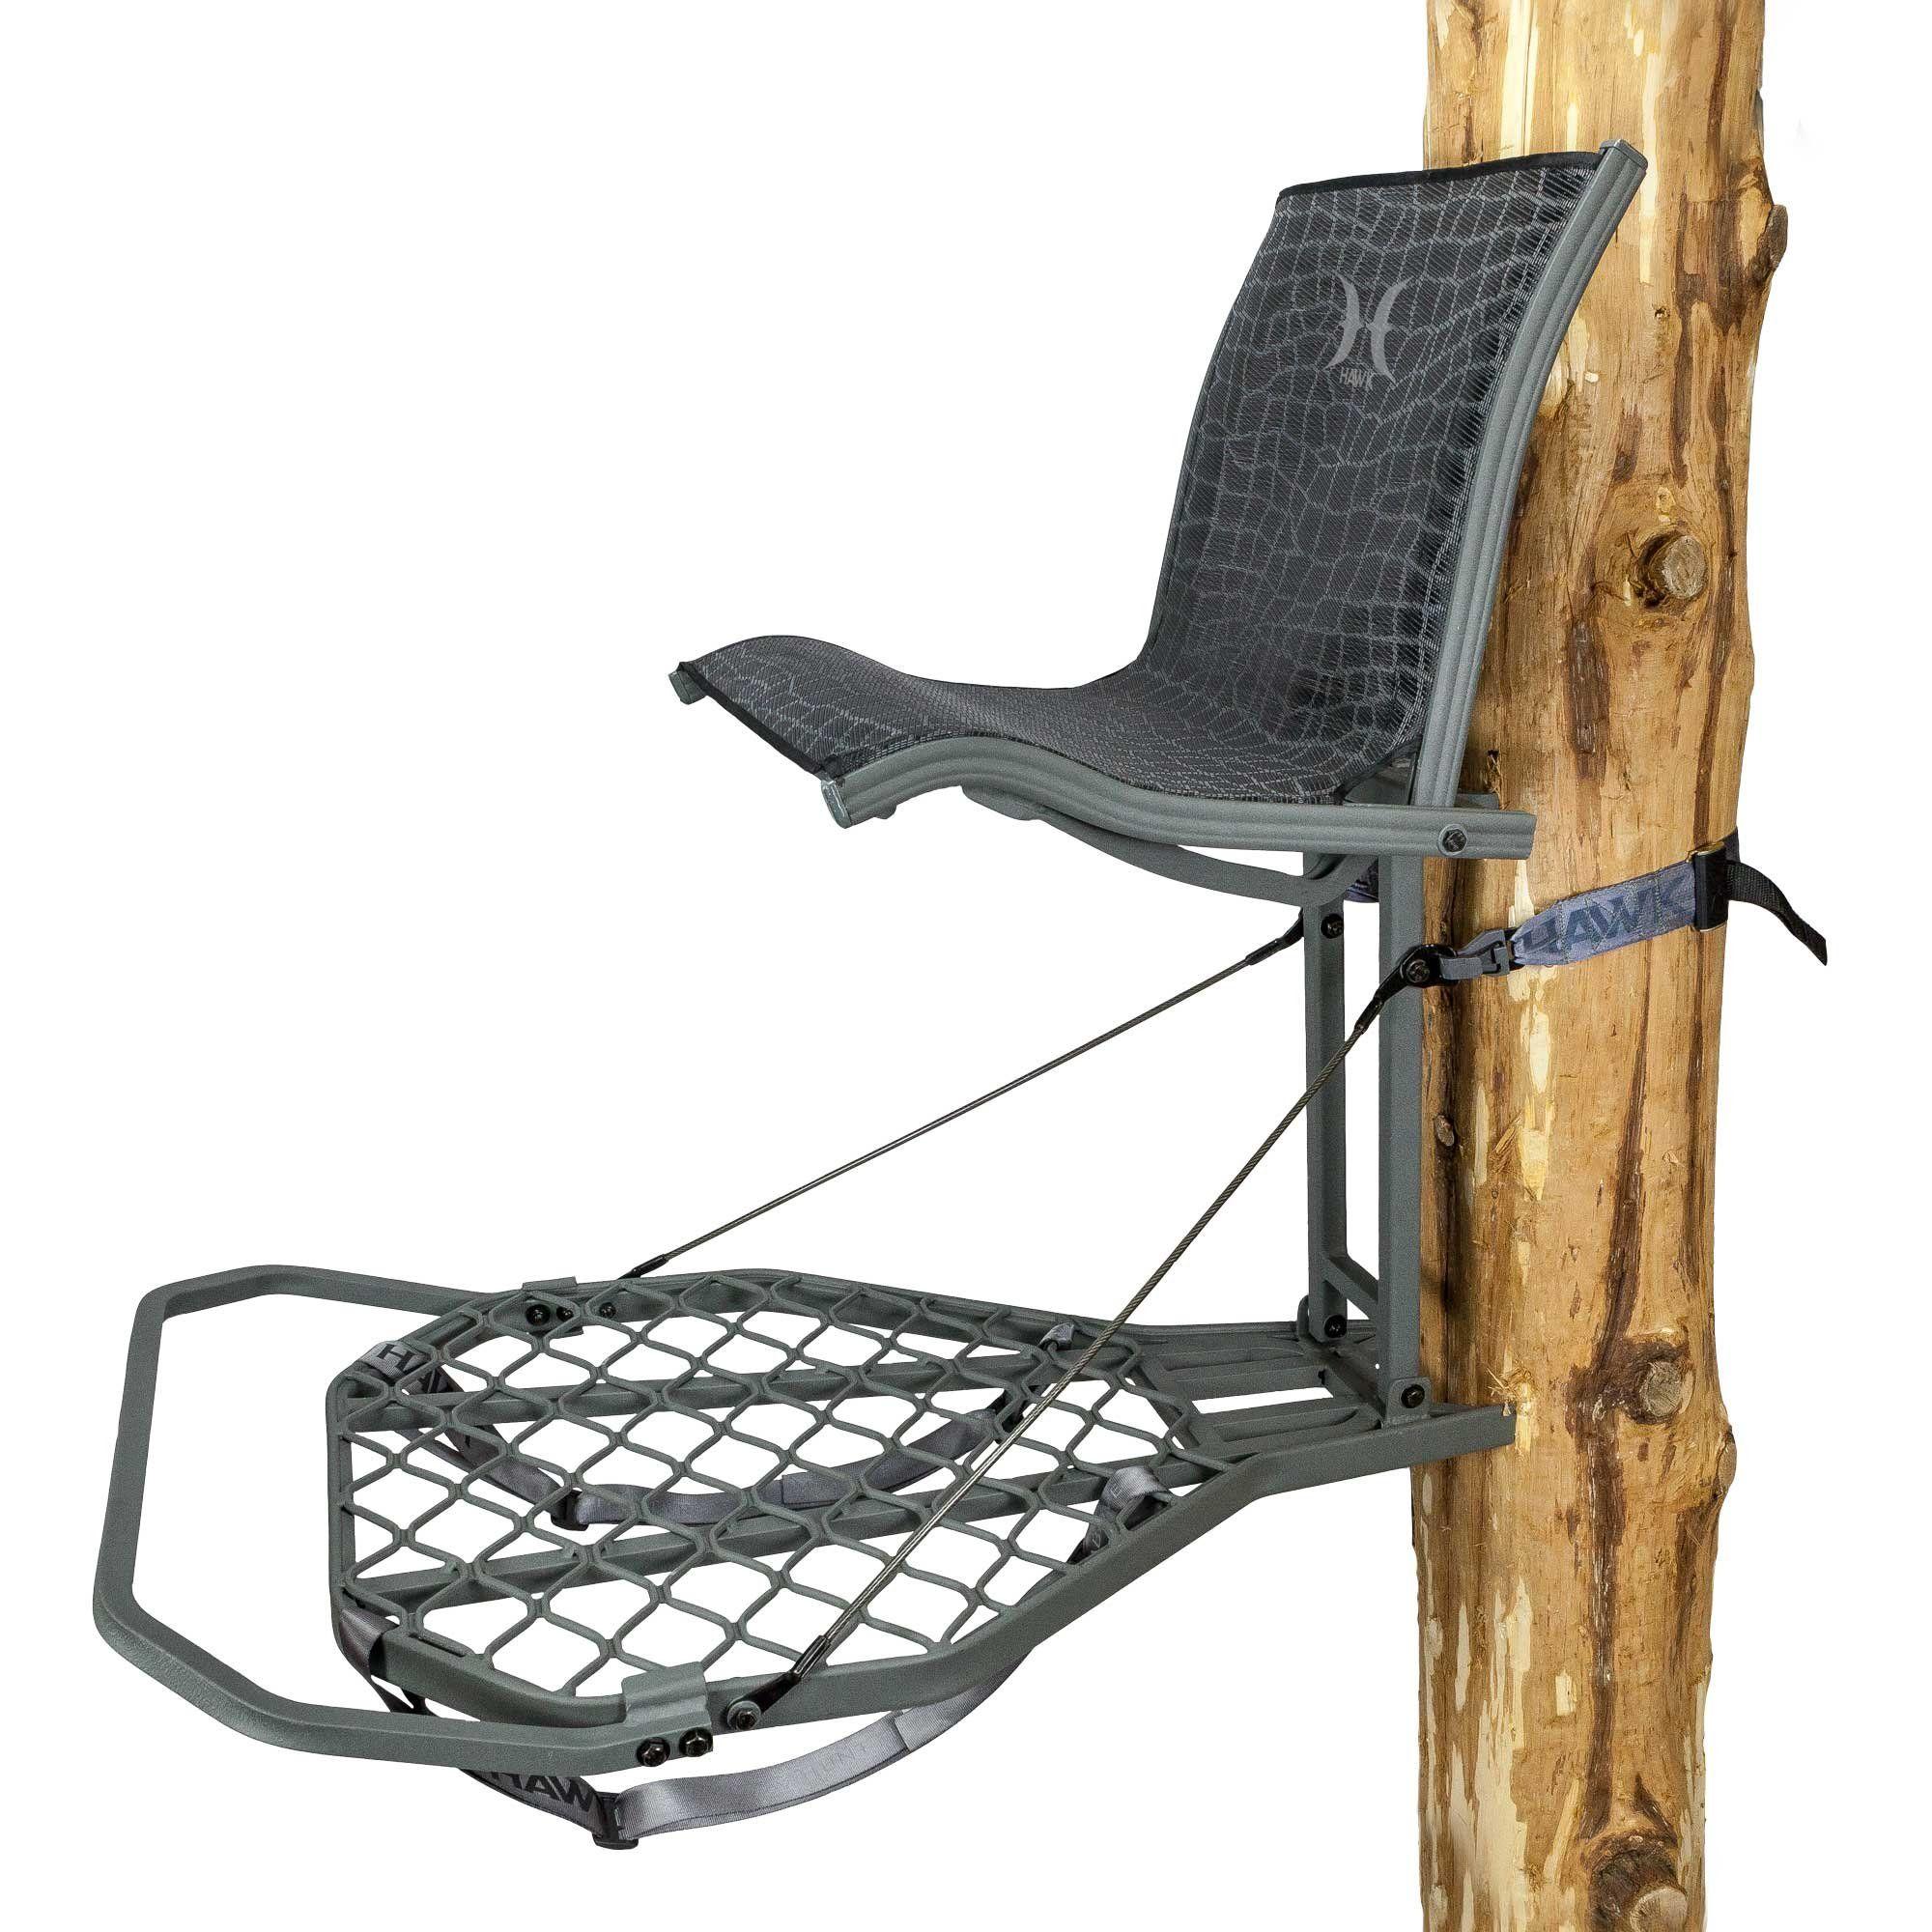 Hawk HELIUM KICKBACK HangOn Treestand https